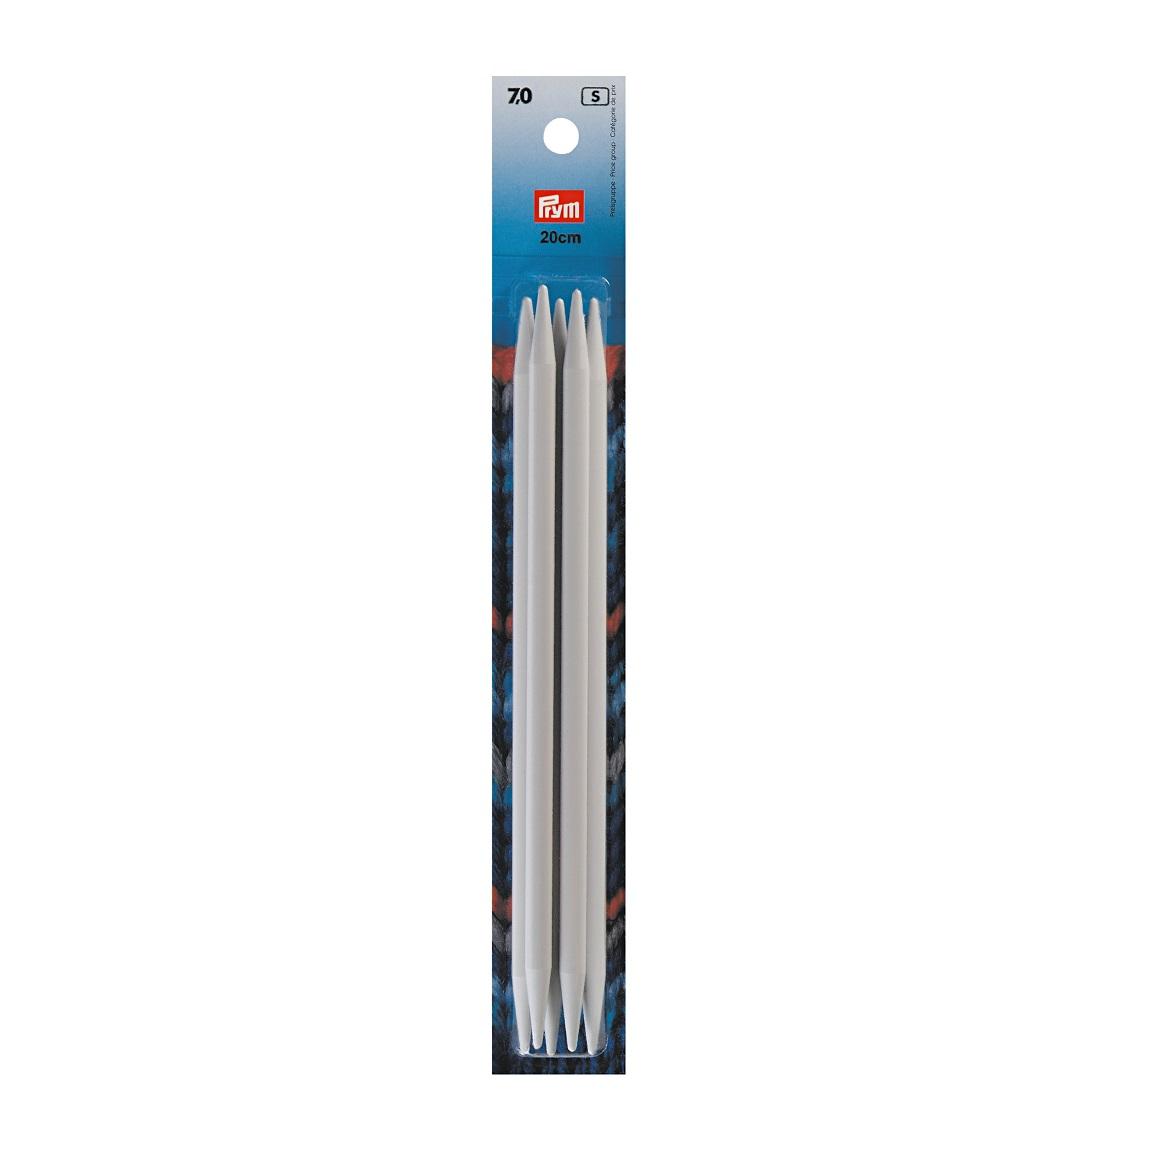 Strumpfstricknadeln, metall, 20 cm, 7,00 mm. Prym 218645